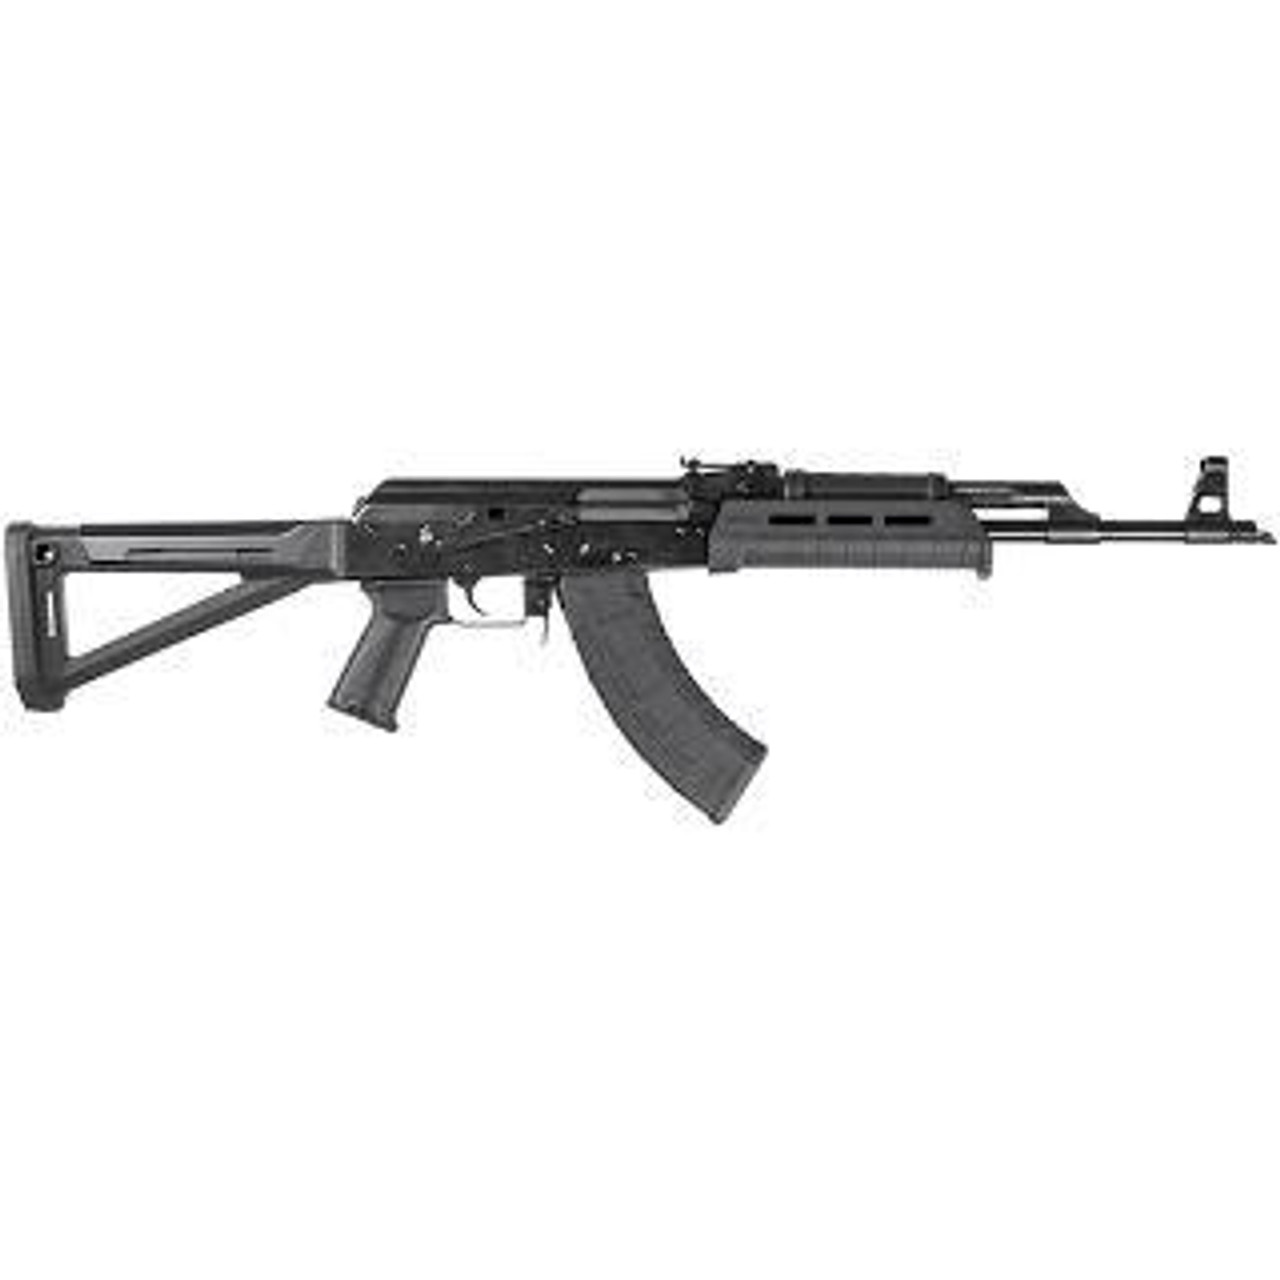 Century Arms RAS47 MOE MAGPUL CALIFORNIA LEGAL- 7.62x39